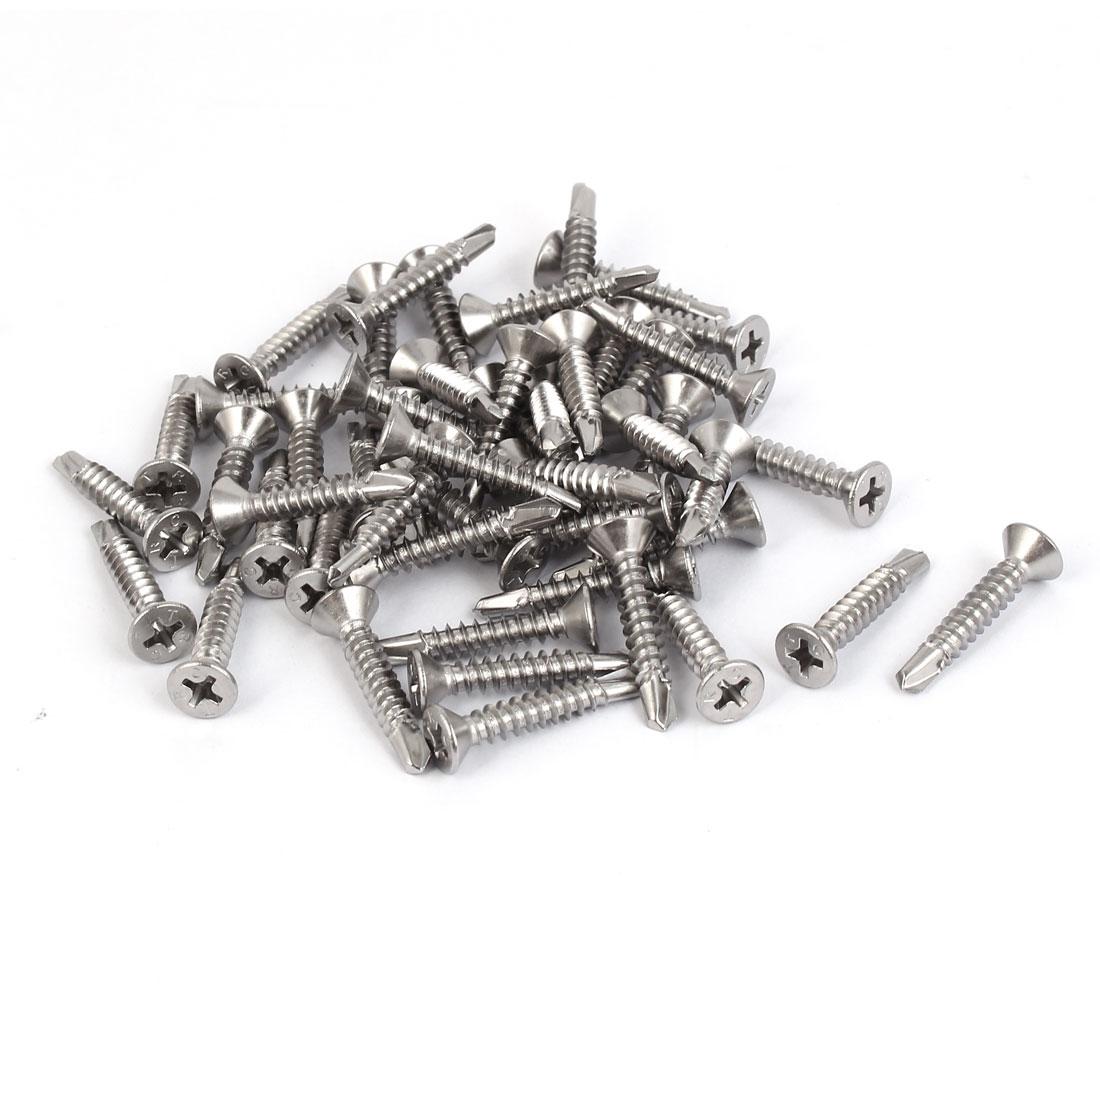 M4.2 #8 Male Thread Self Drilling Countersunk Head Screws 25mm Length 50 Pcs